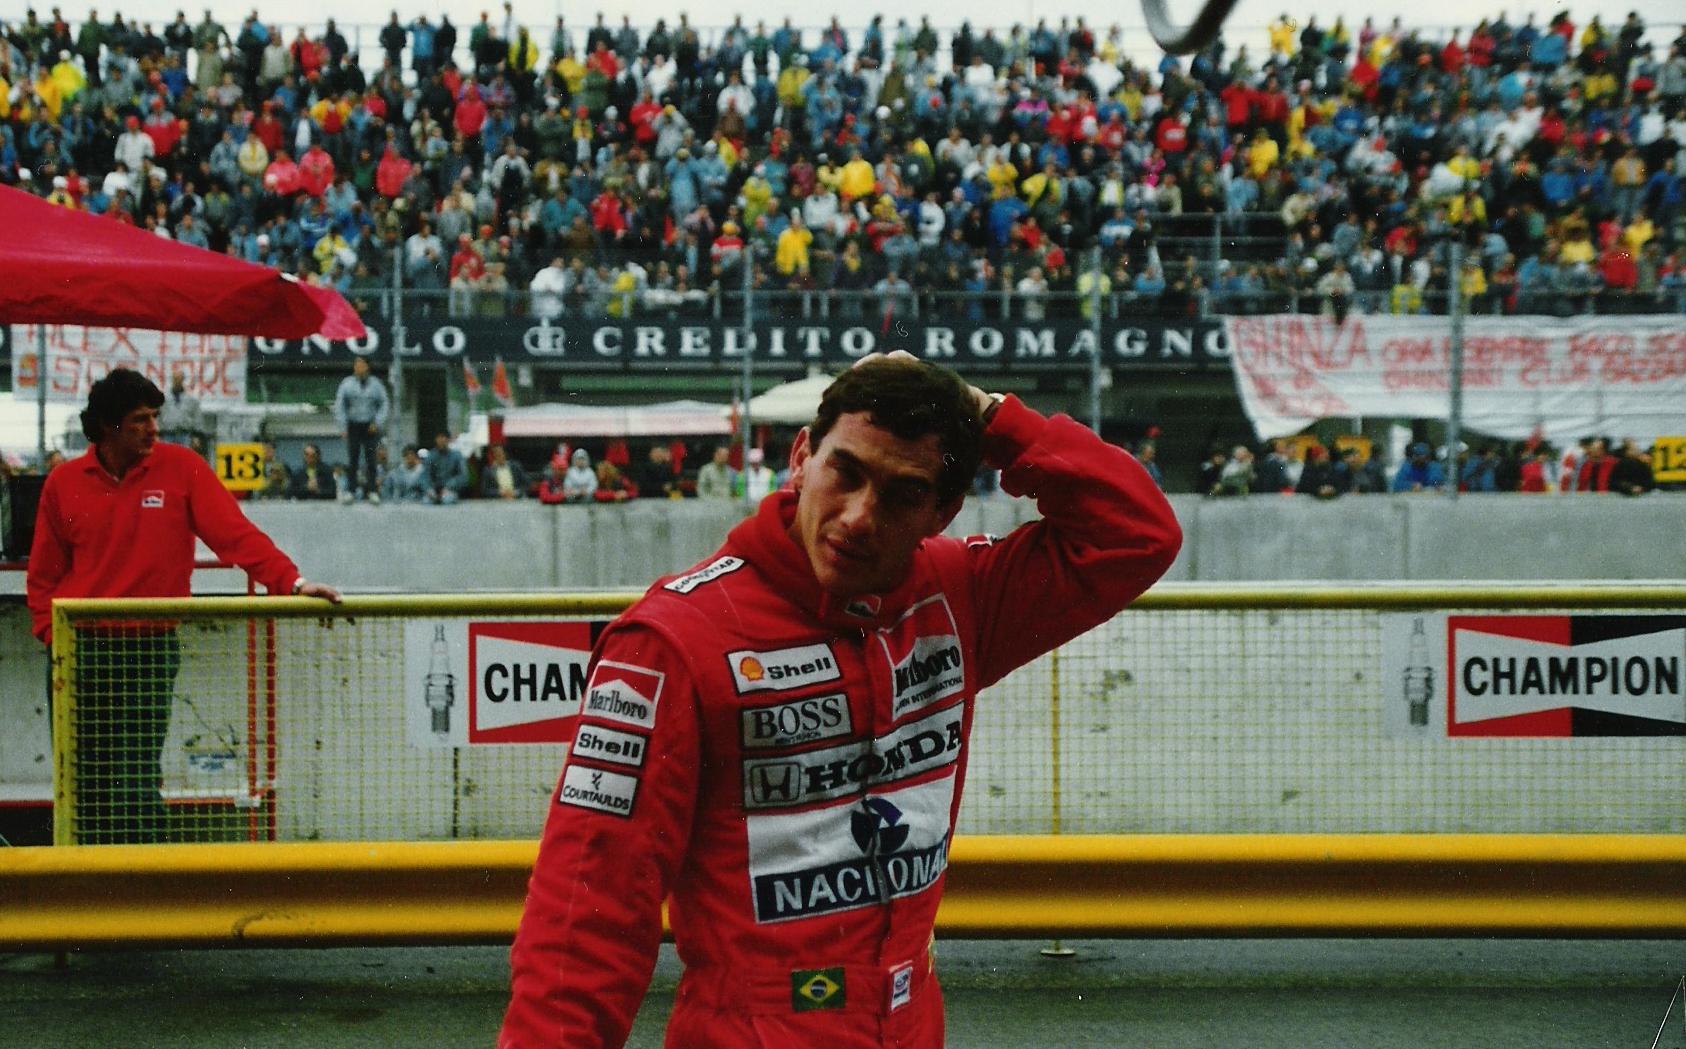 FasciculusAyrton Senna Imola 1989